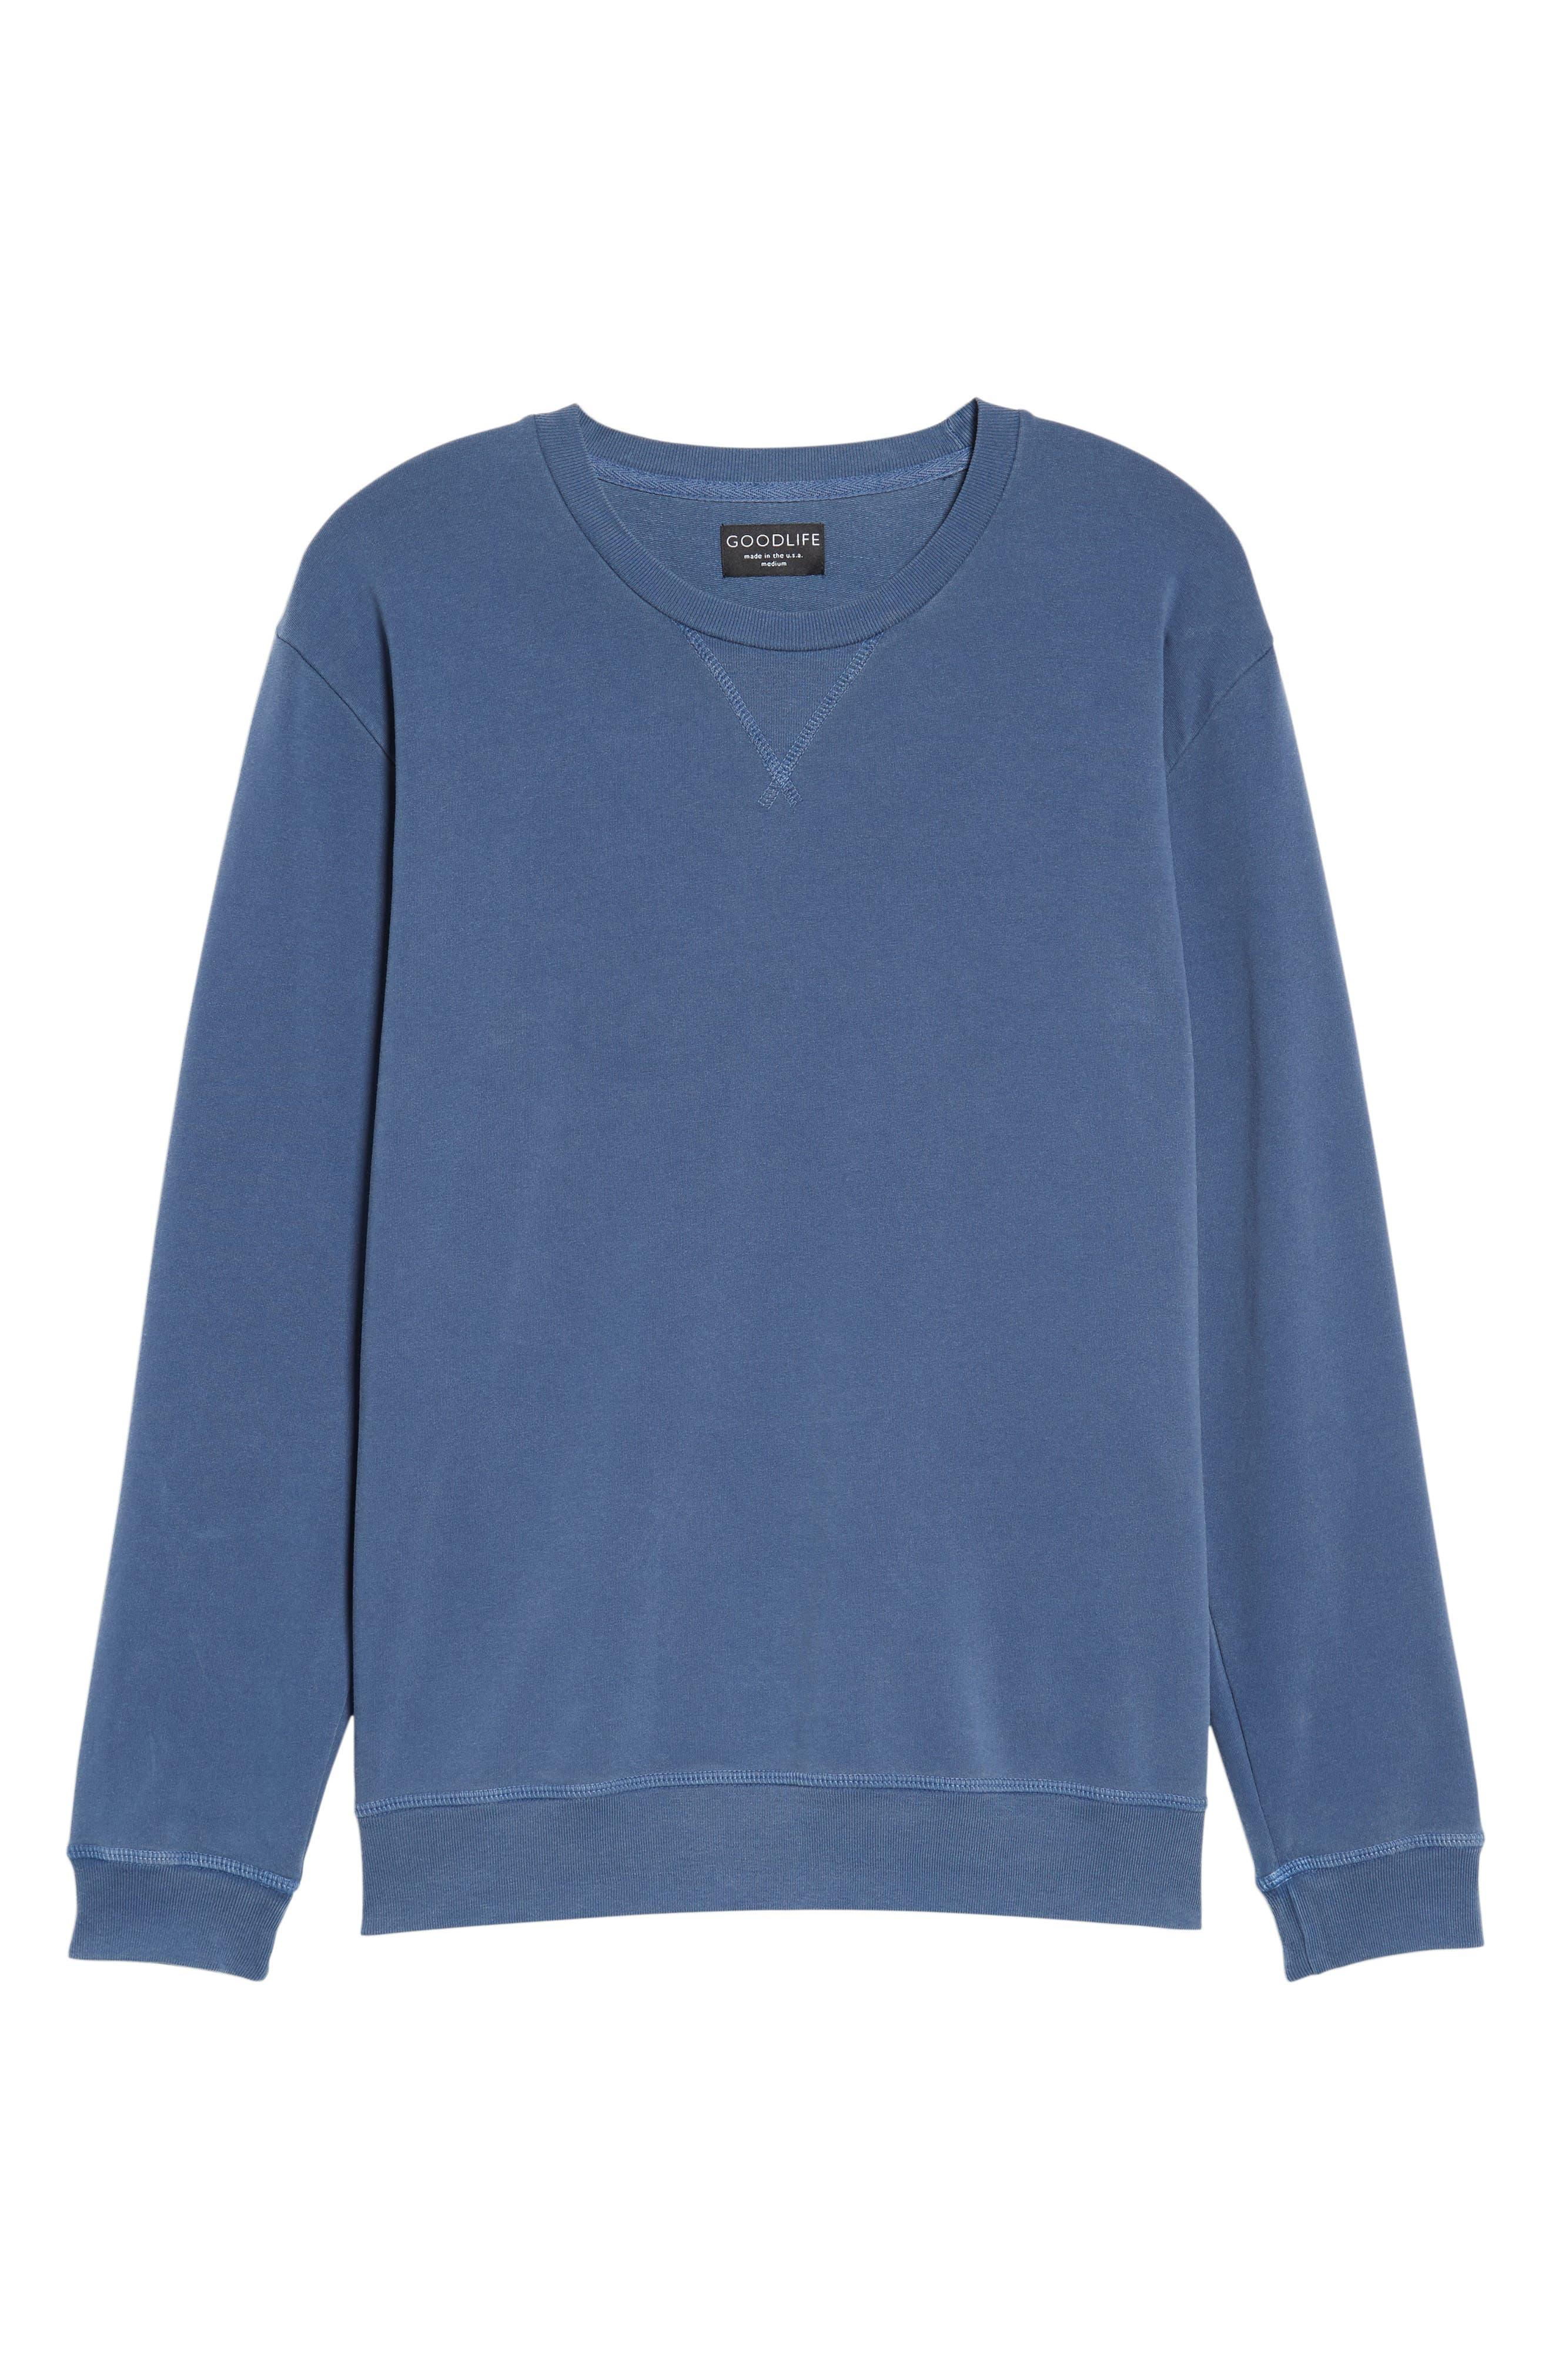 GOODLIFE, Slim Fit Crewneck Sweatshirt, Alternate thumbnail 6, color, FADED NAVY